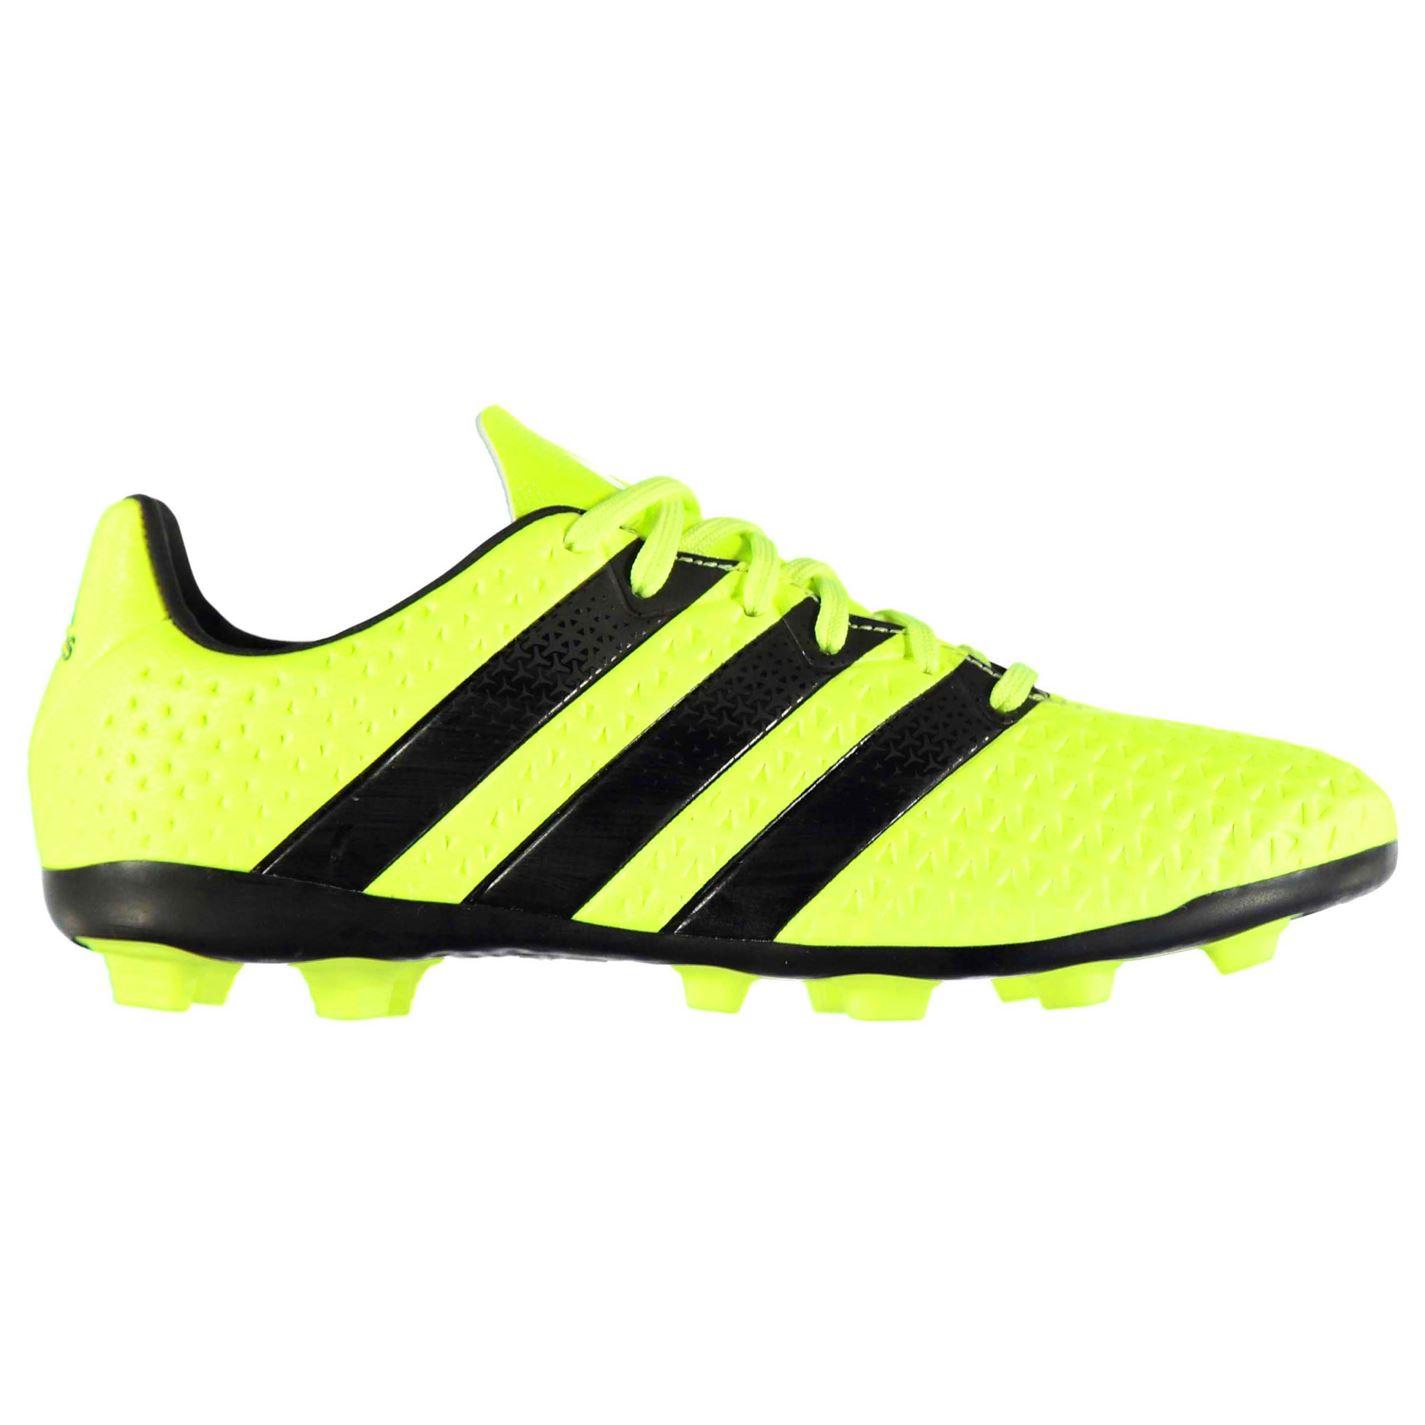 adidas Ace 16.4 FG Football Boots Junior Solar Yellow - Glami.sk f4b4ccd4ed